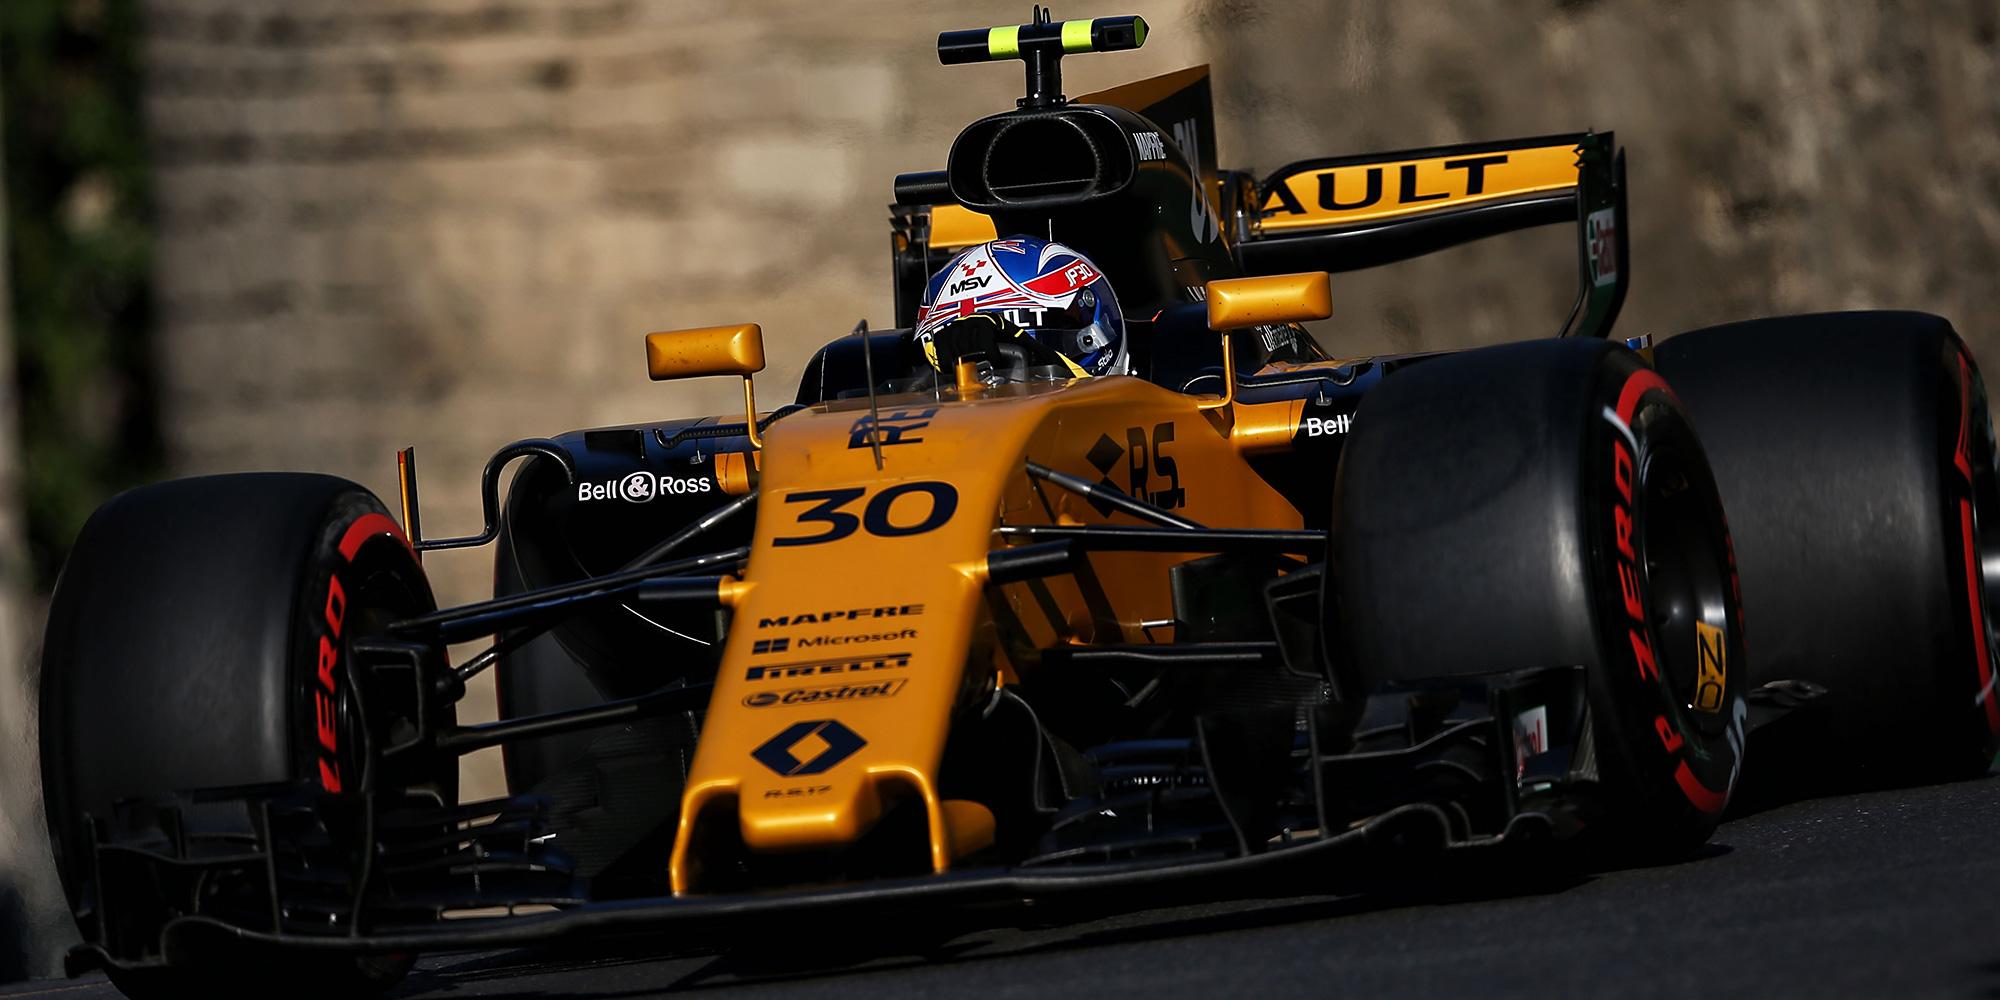 Ricciardo gewinnt Grand Prix mit Renault Technologie